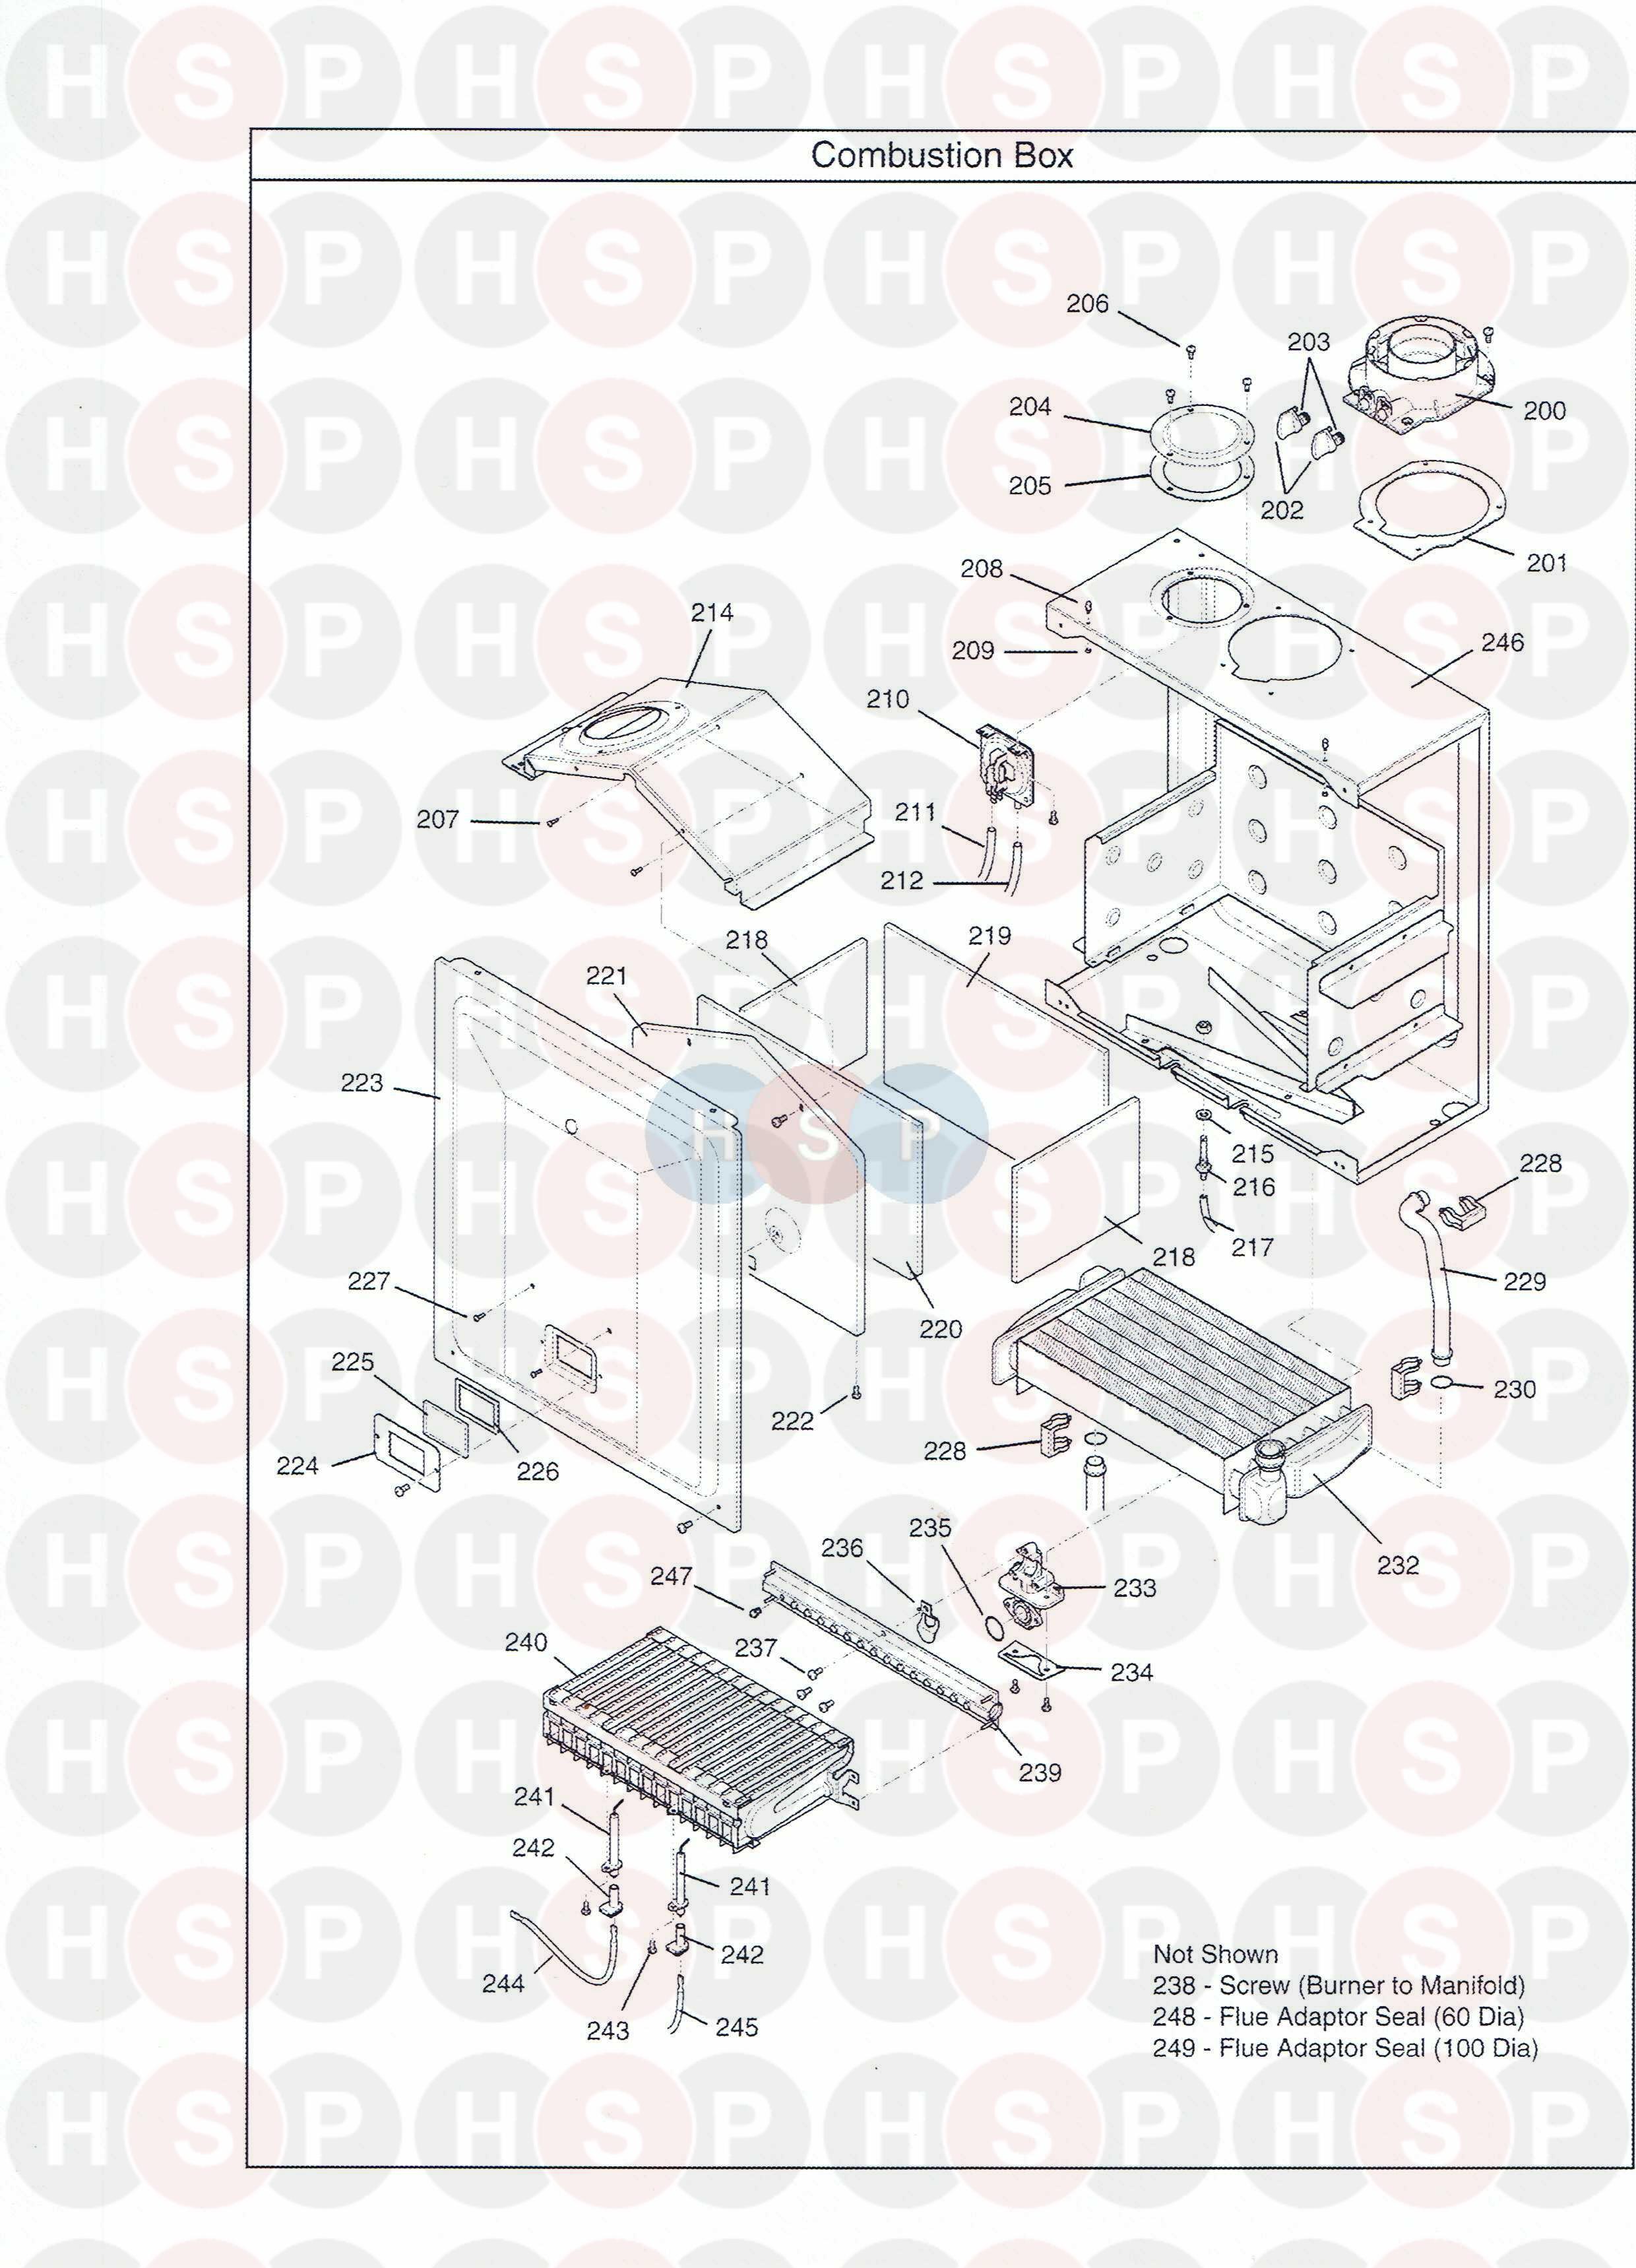 Potterton PERFORMA SYSTEM 18e (Combustion Box) Diagram